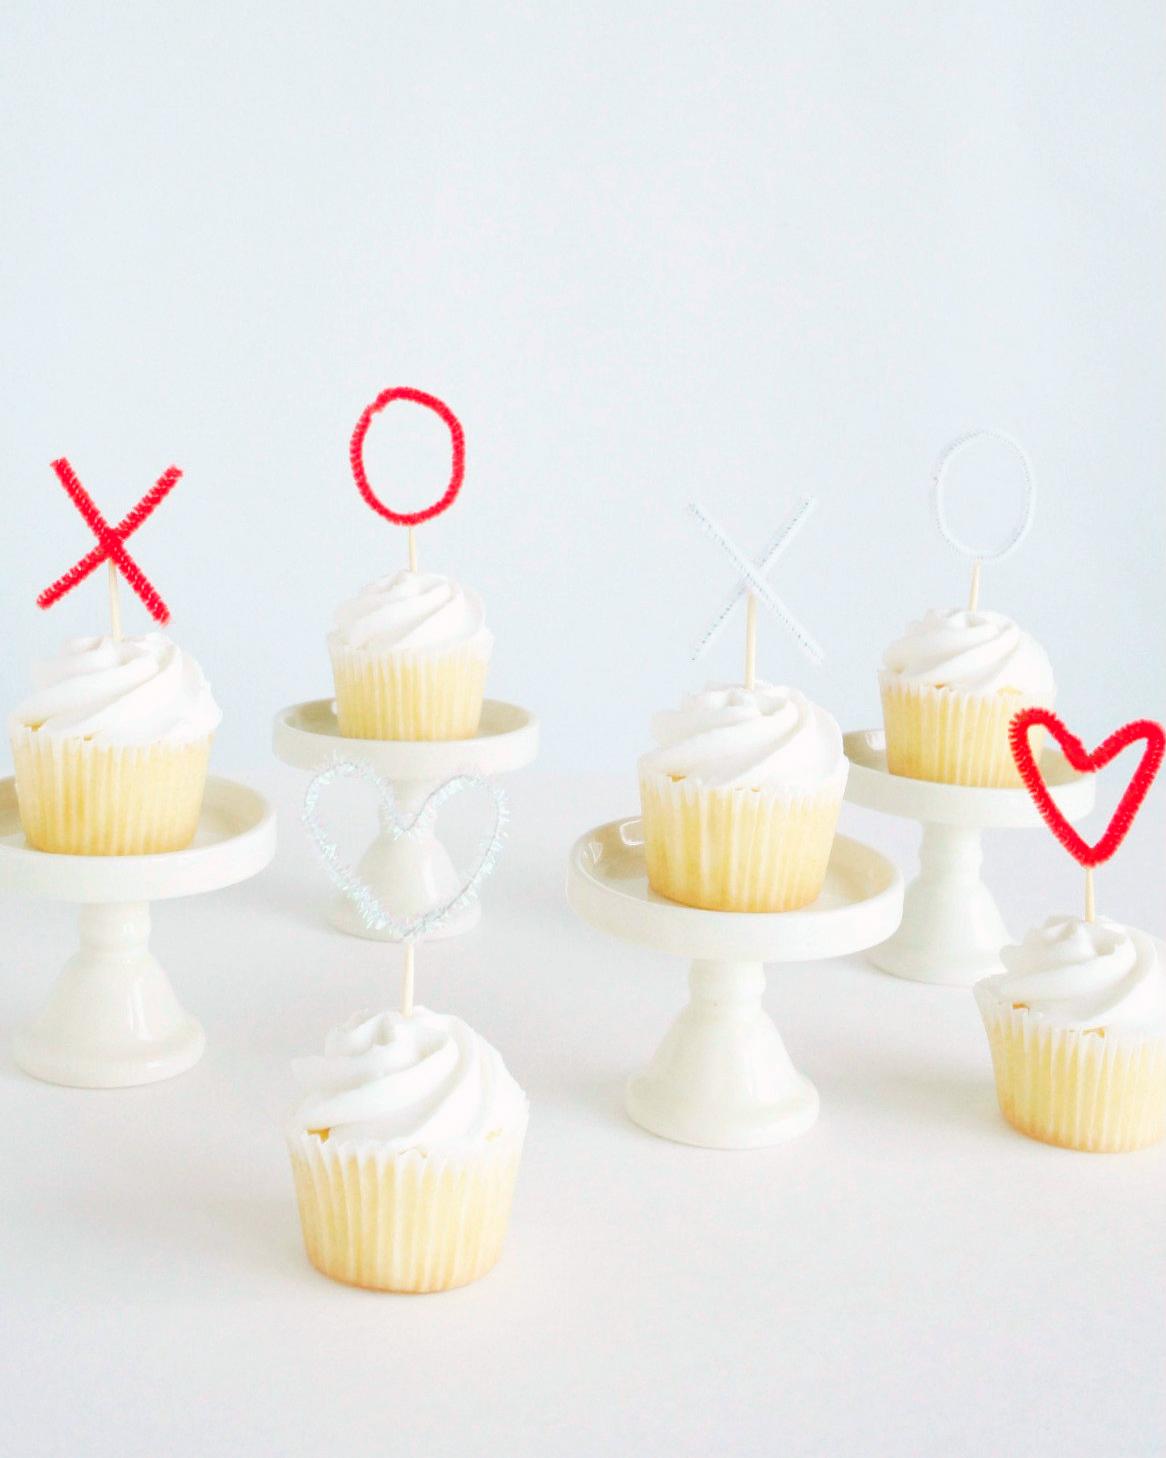 last-minute-valentine-diy-marabou-design-pipe-cleaner-cupcake-toppers-0215.jpg